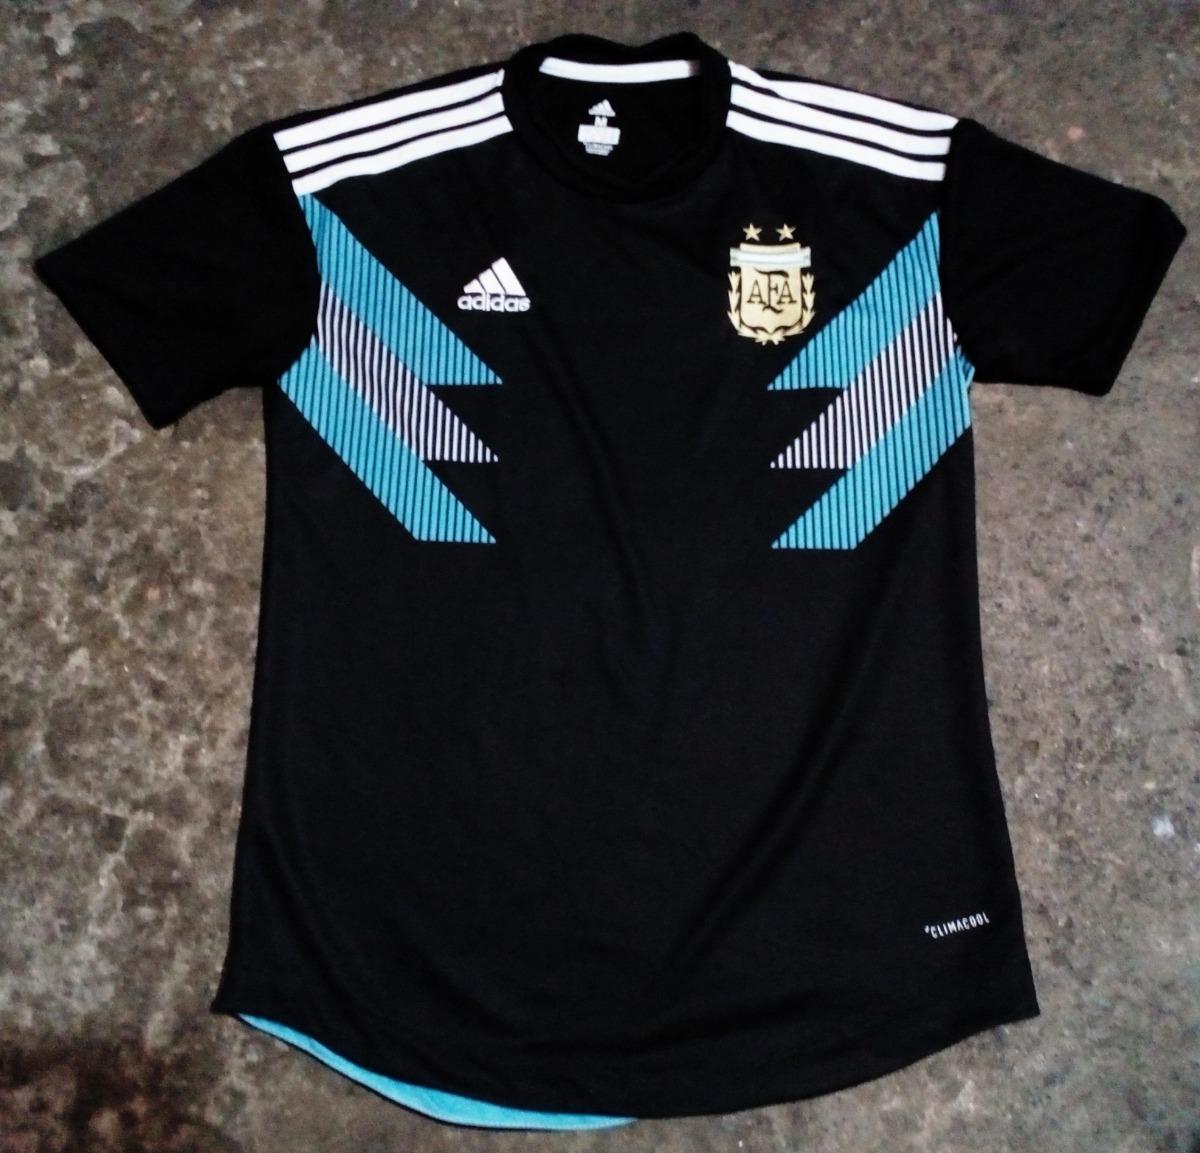 d3c694141d Jersey De Argentina Visitante Negra (hecho En México) -   390.00 en ...